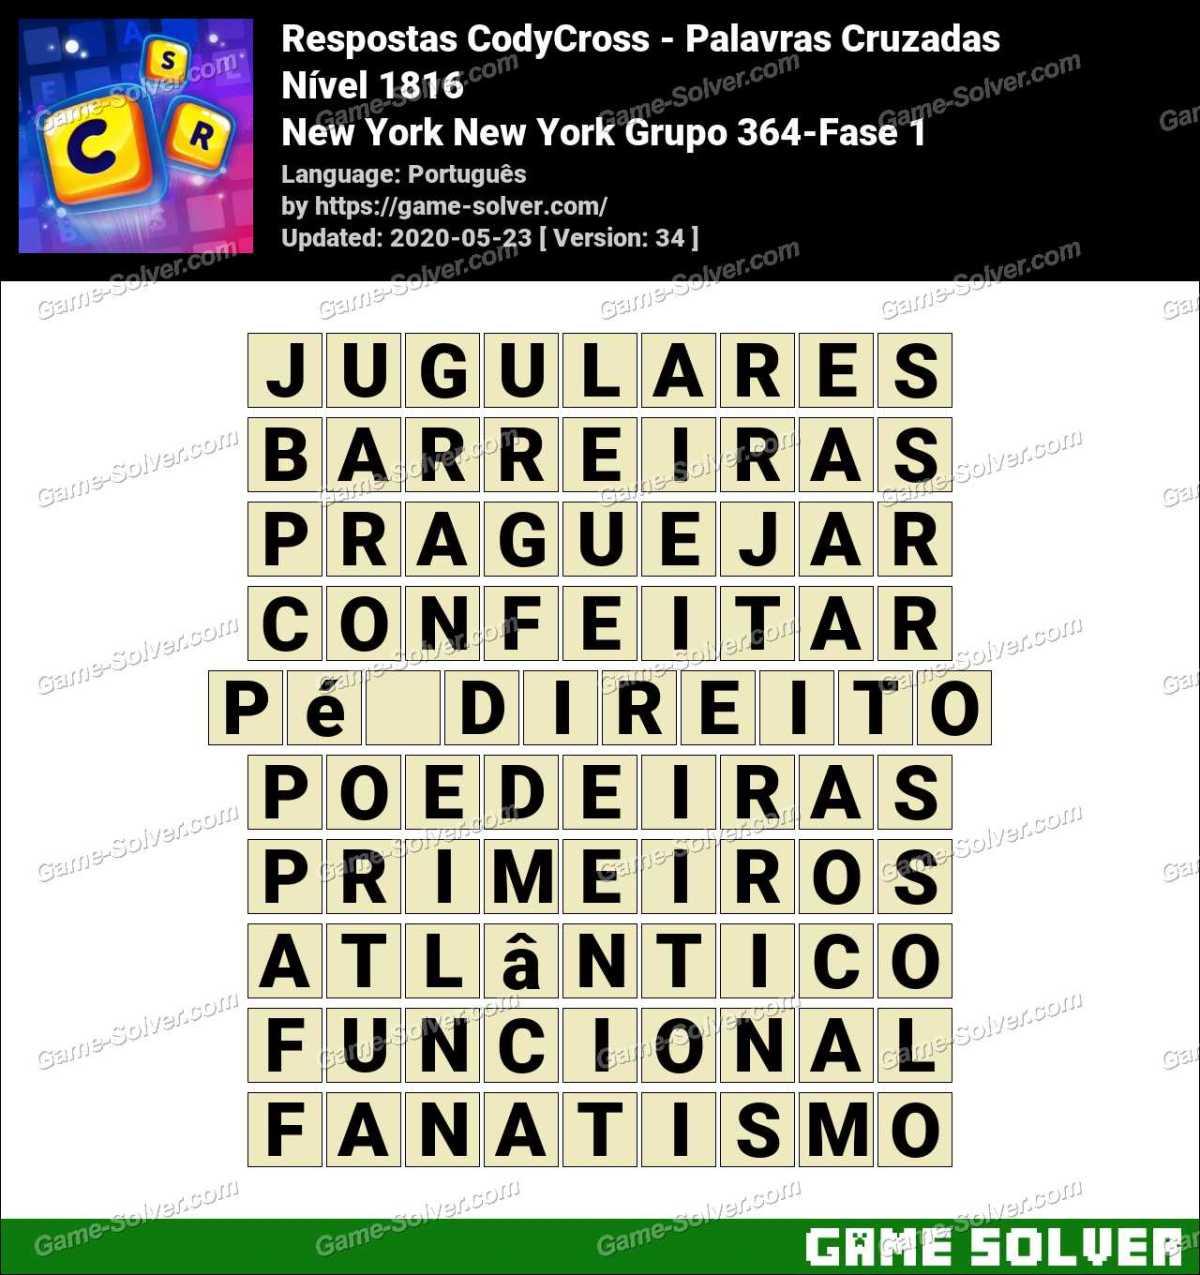 Respostas CodyCross New York New York Grupo 364-Fase 1